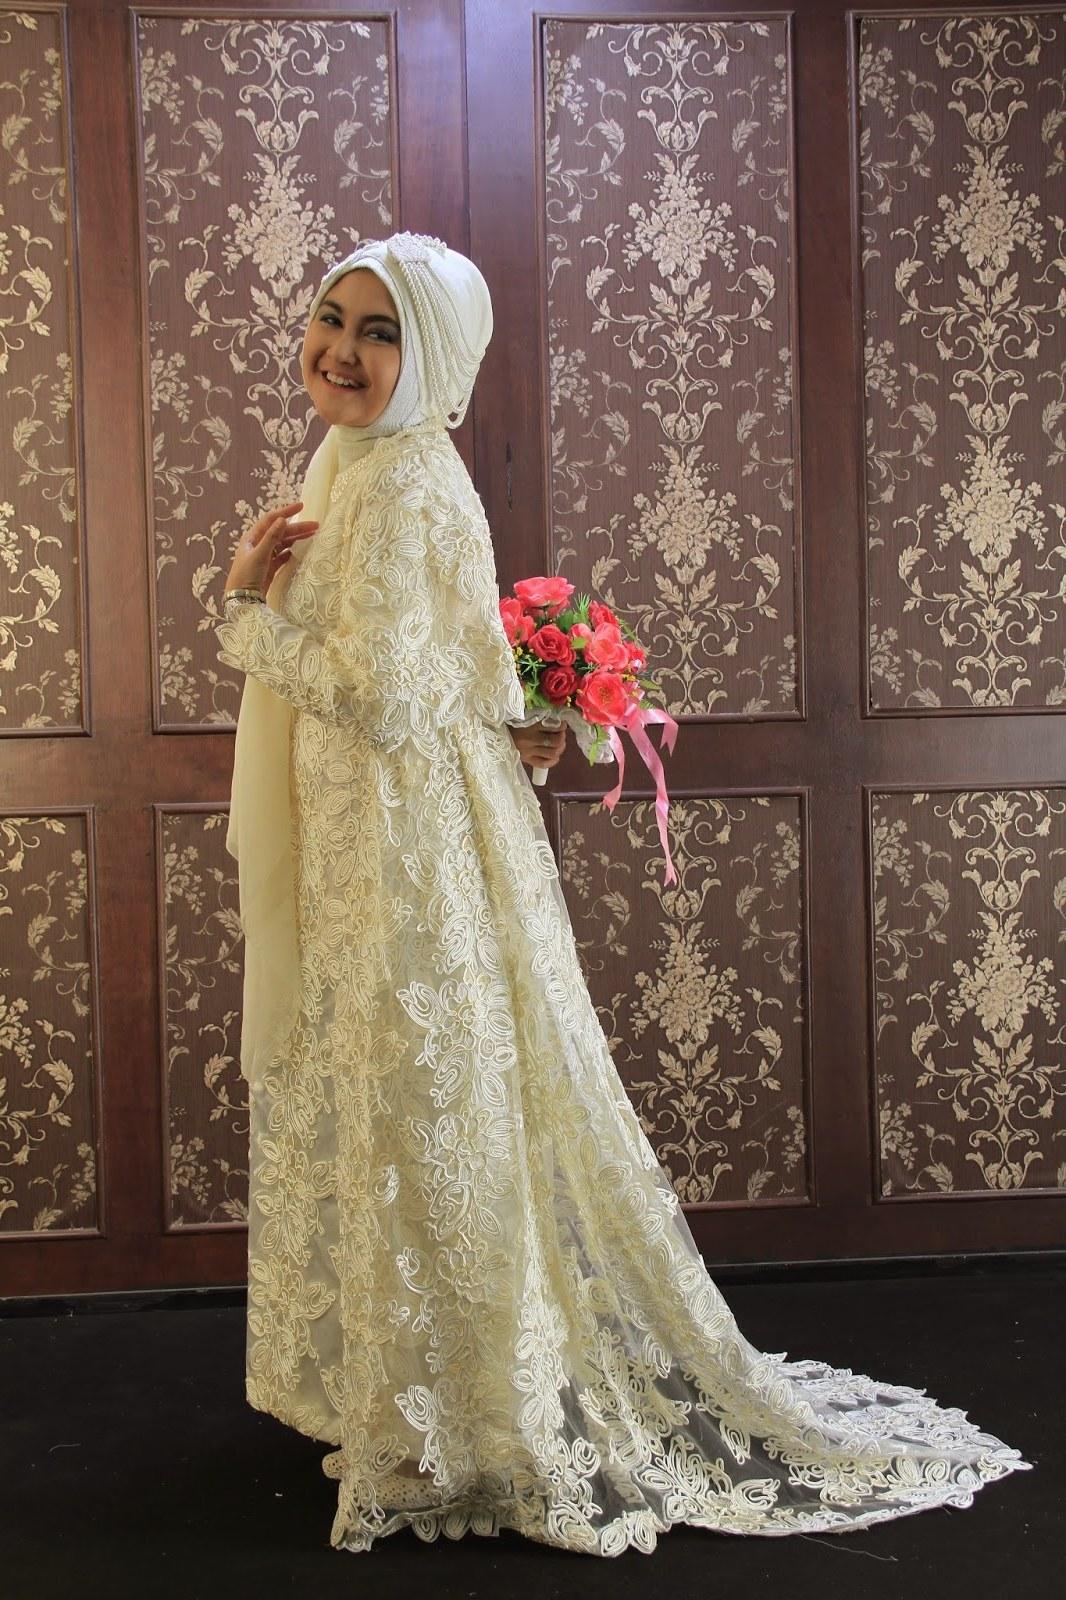 Design Gaun Pengantin 2016 Muslim Rldj Padme Wedding Dress Confessions Of A Seamstress the